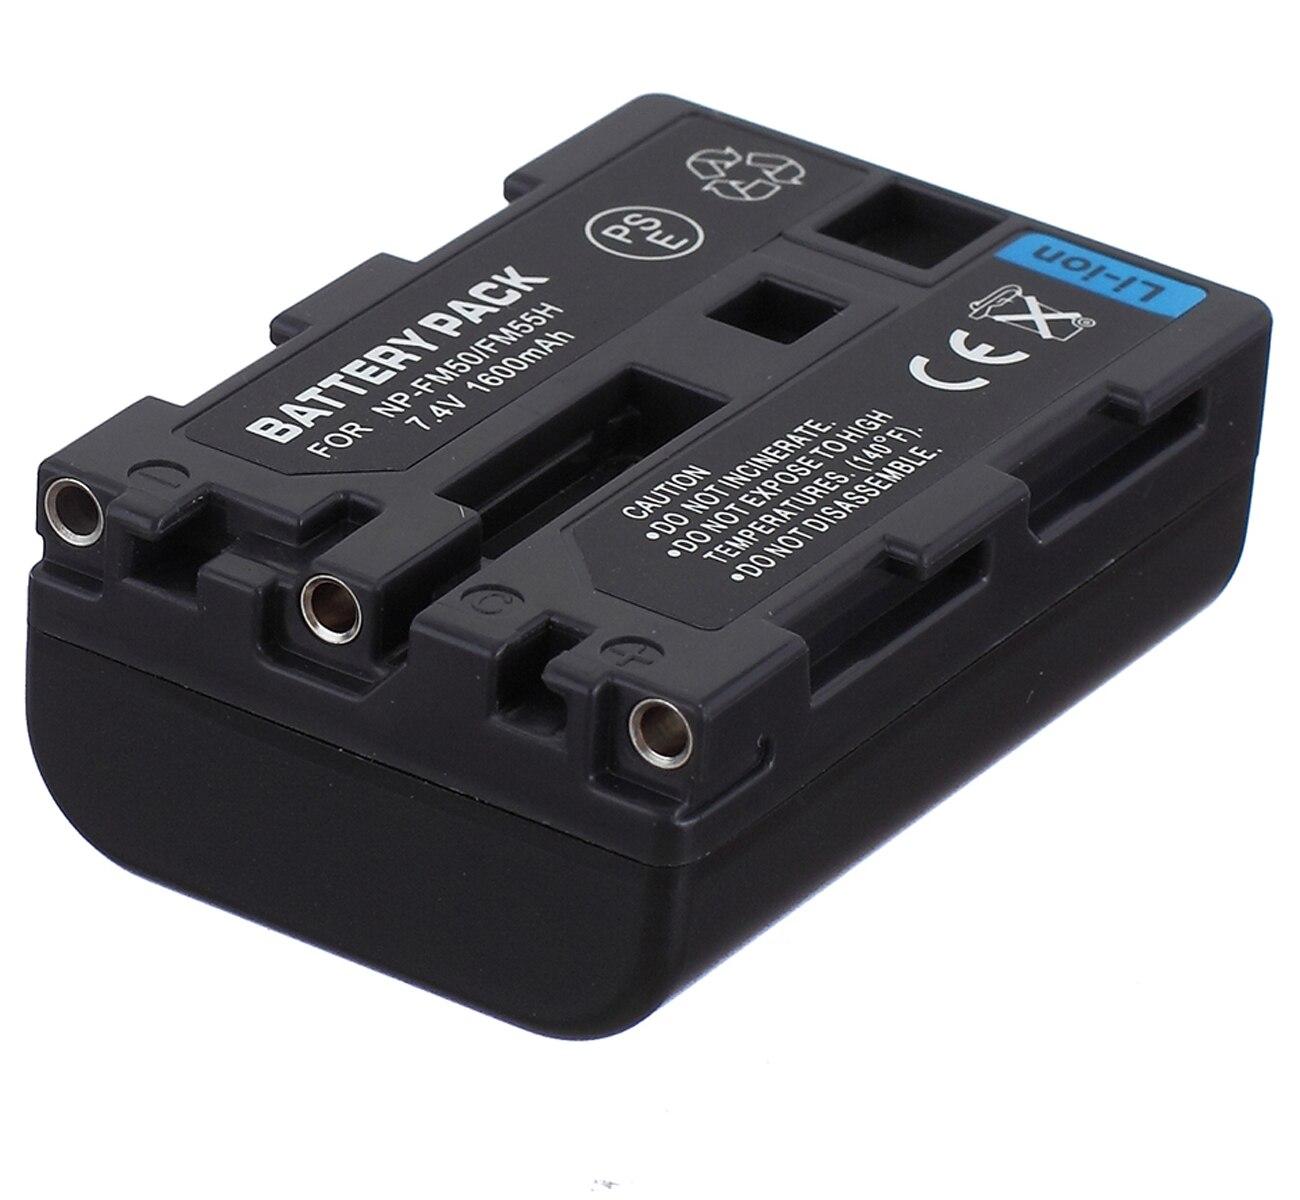 Paquete de baterías para videocámara Sony HVR-A1, HVR-A1E, HVR-A1J, HVR-A1N, HVR-A1P, HVR-A1U...